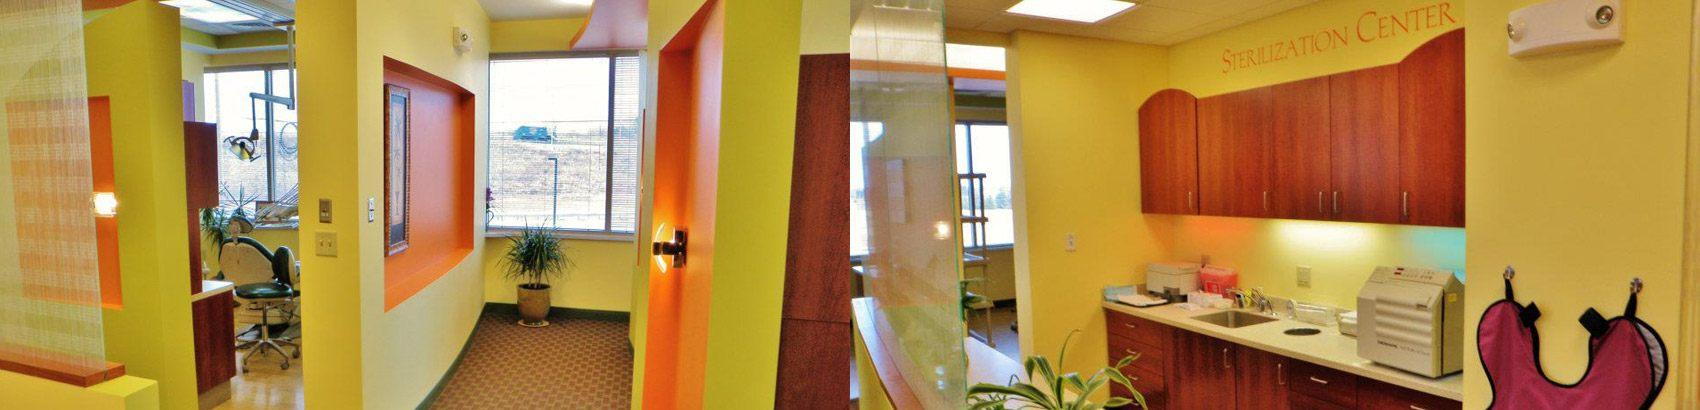 Tour Our Office - Asuncion Dental Group